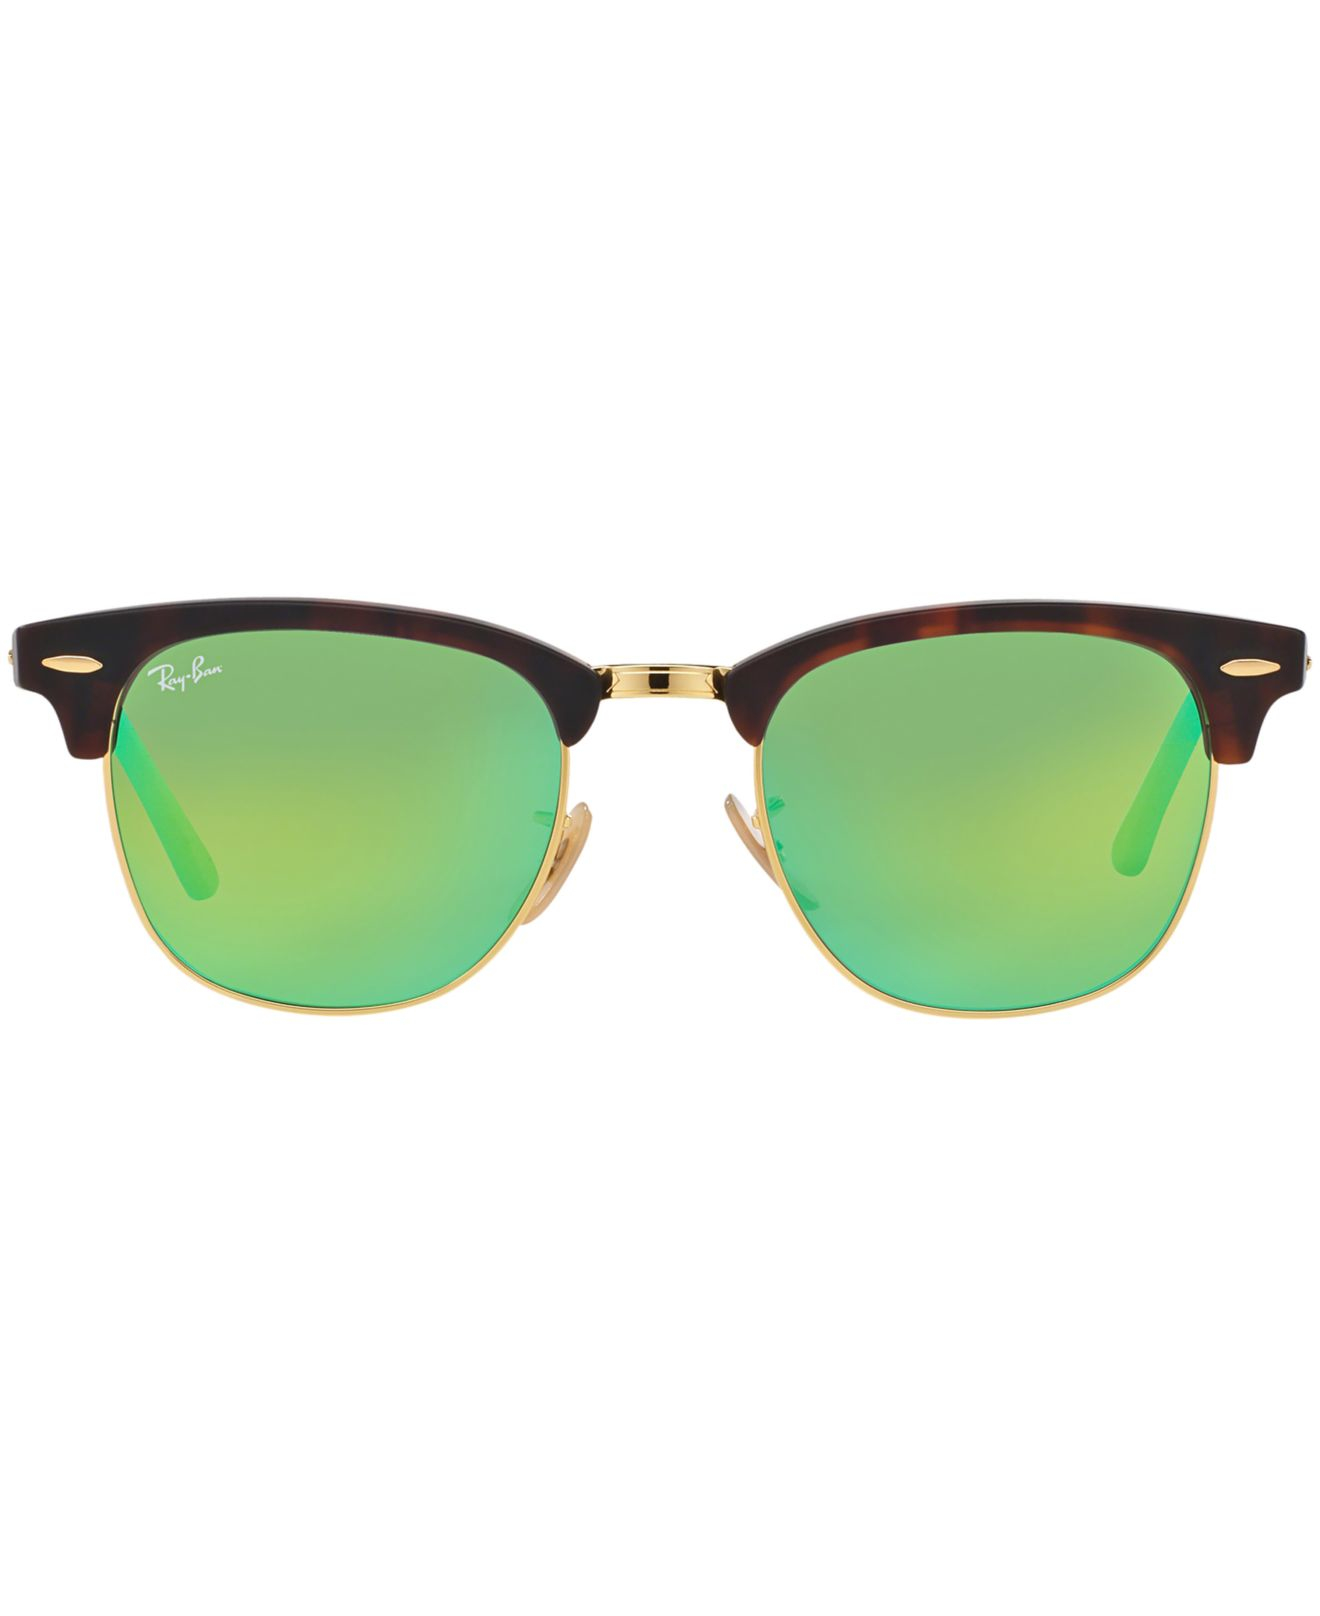 Ray Ban 3016 Mirror Green Glass « Heritage Malta 951163735d7a